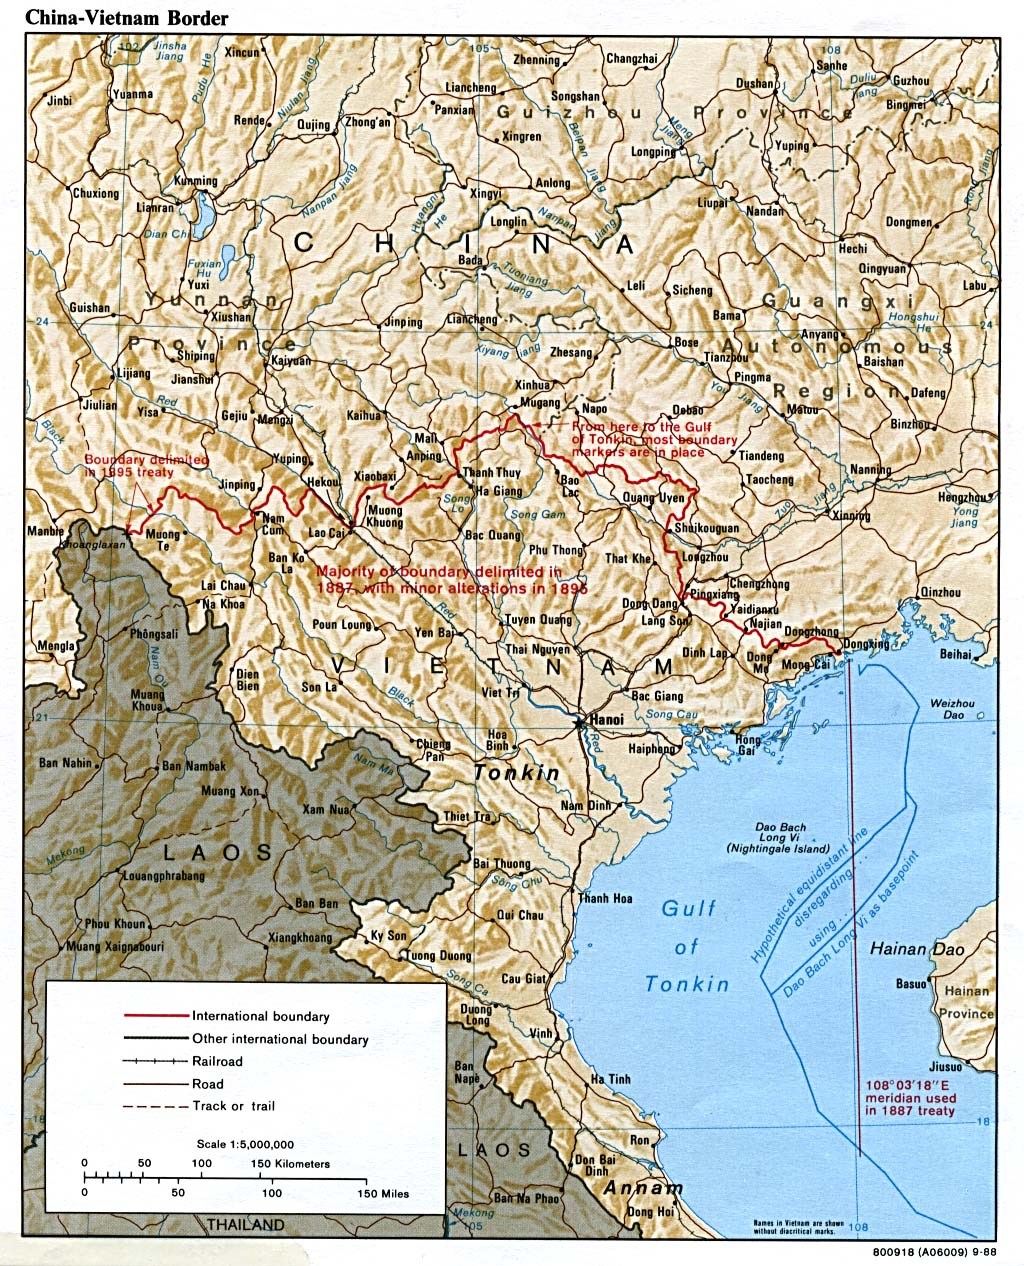 Mapa de la Frontera China - Vietnam